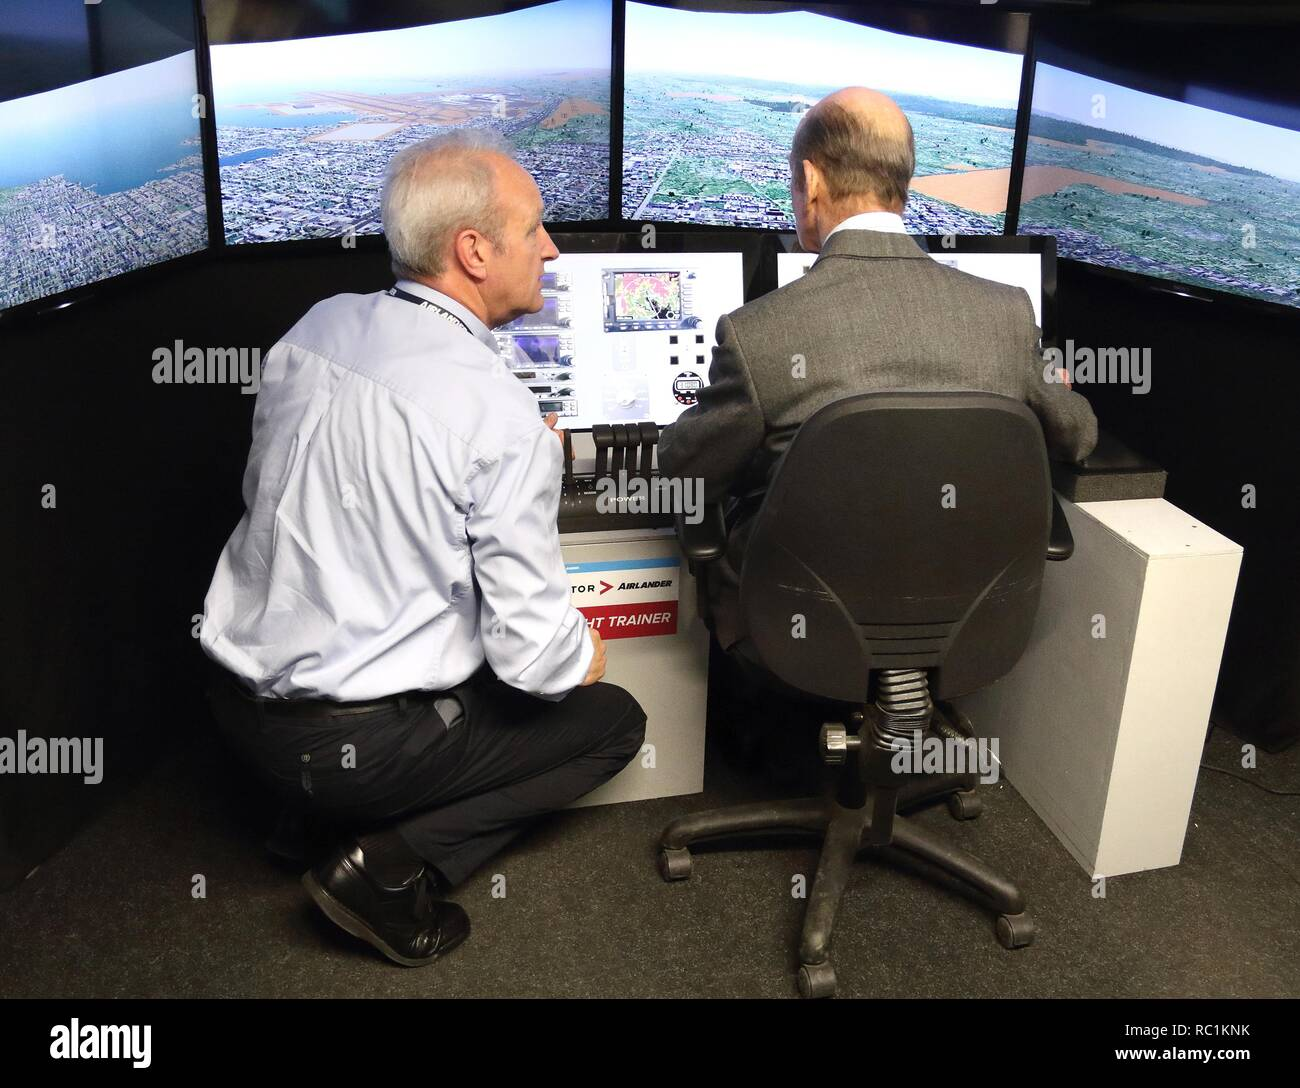 Test Simulator Stock Photos & Test Simulator Stock Images